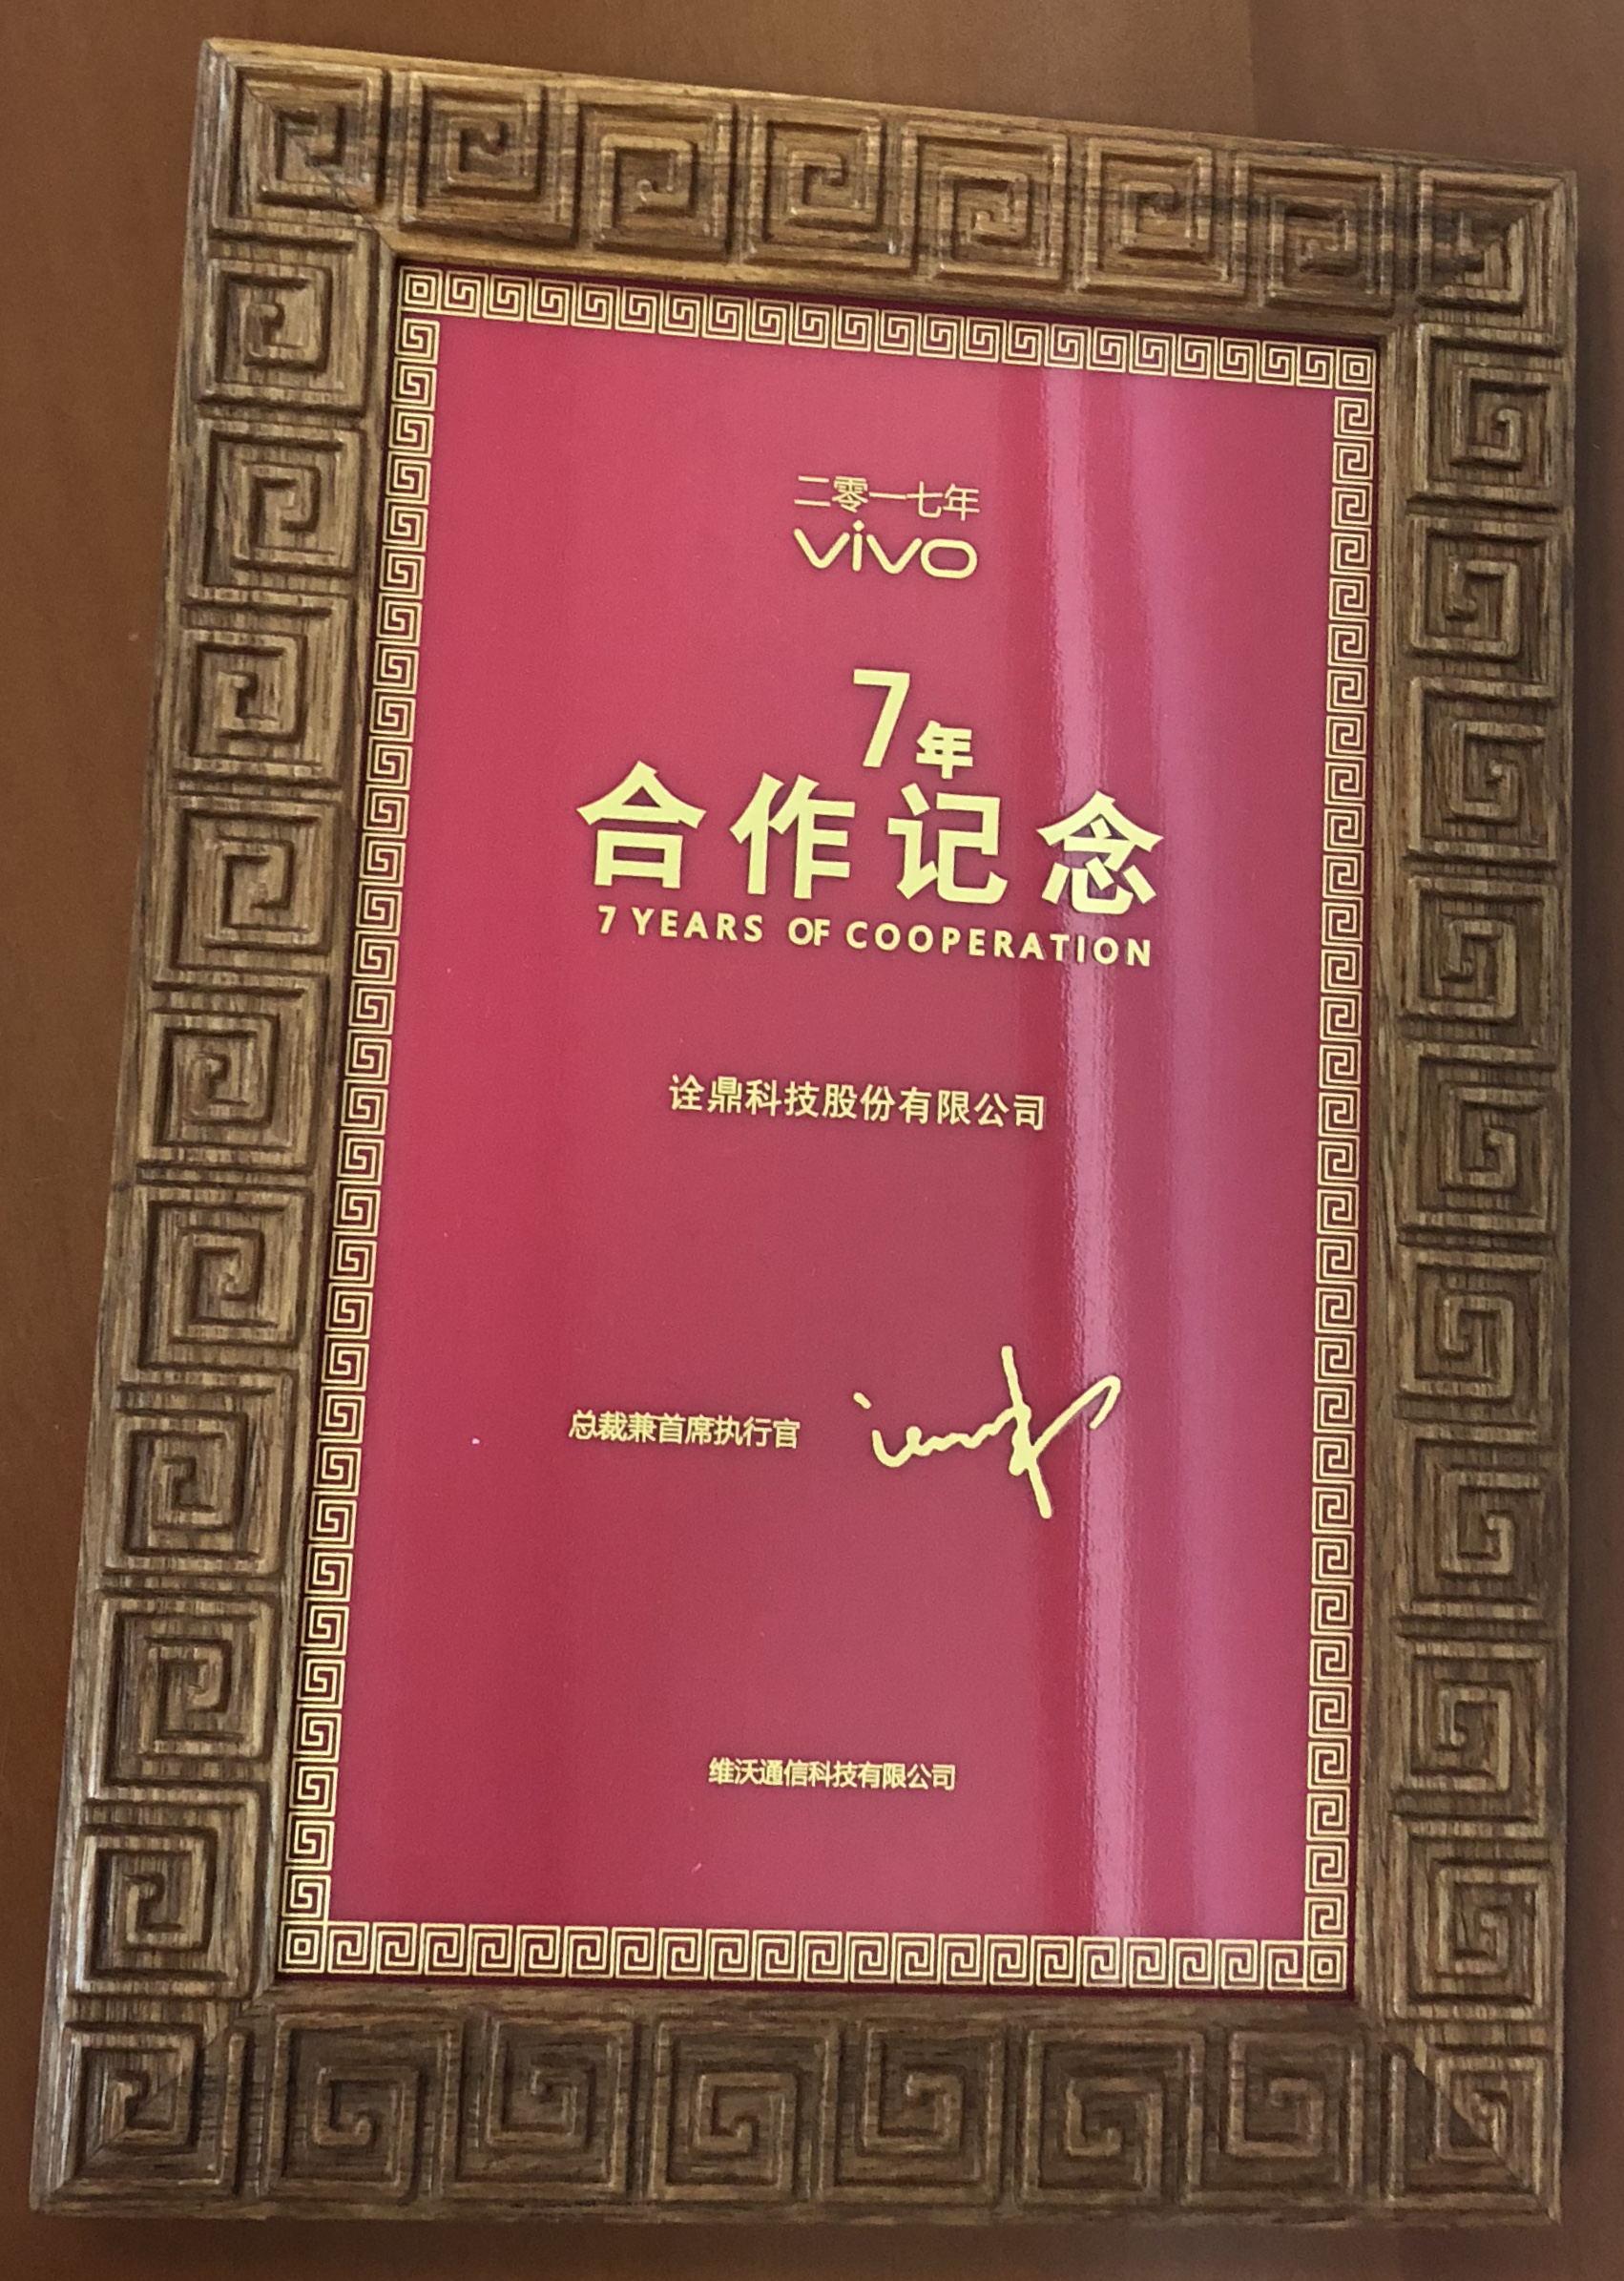 Award for 7 Anniversary